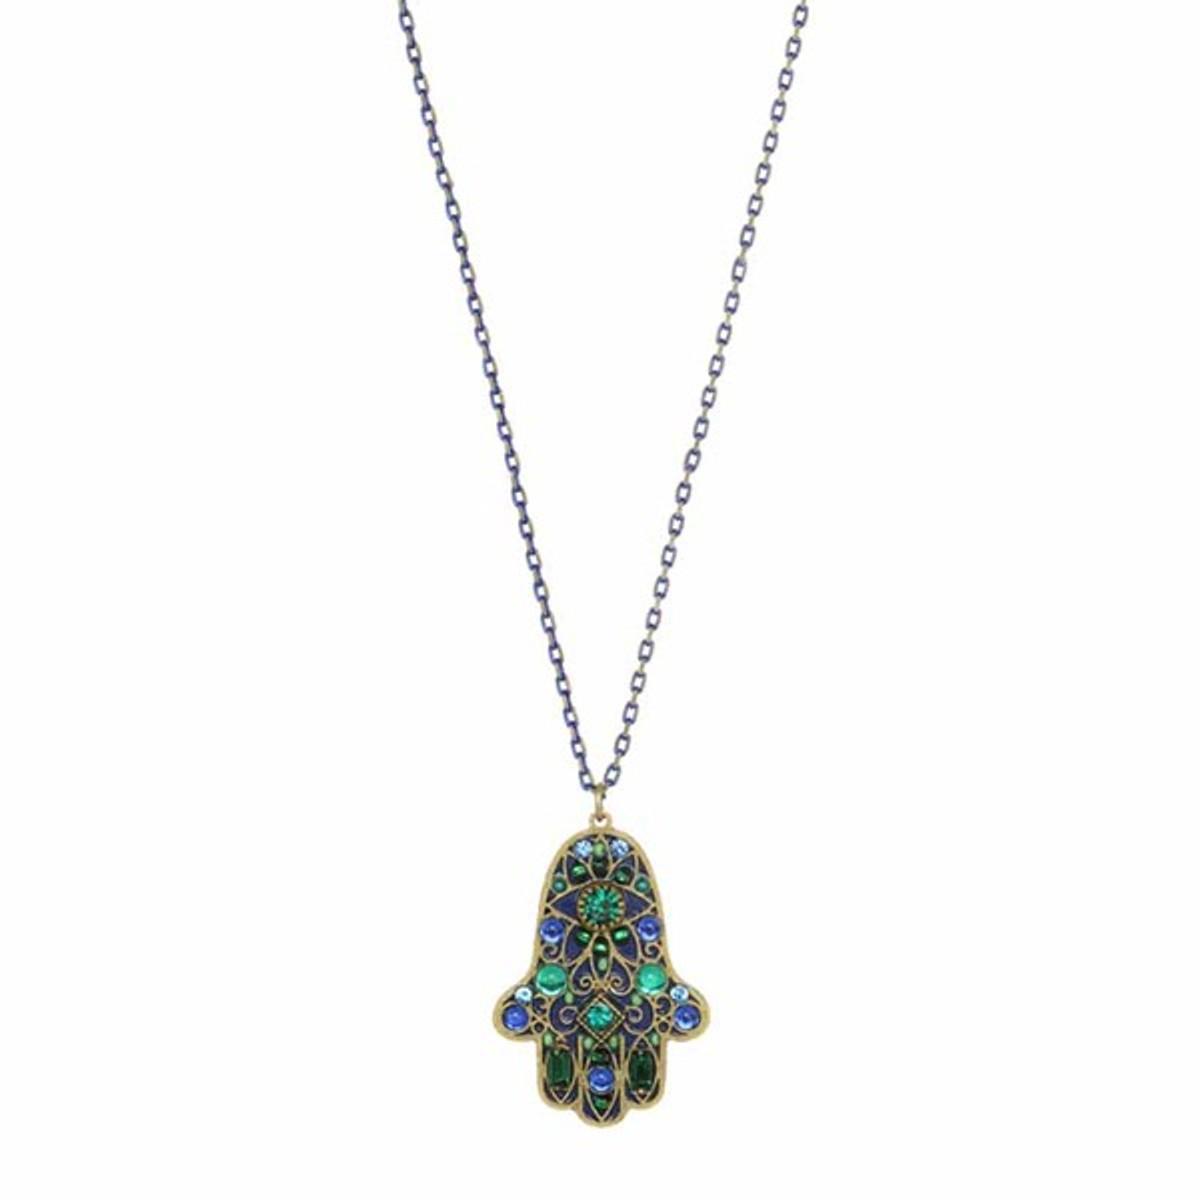 Green Hamsa Necklace on Single Chain